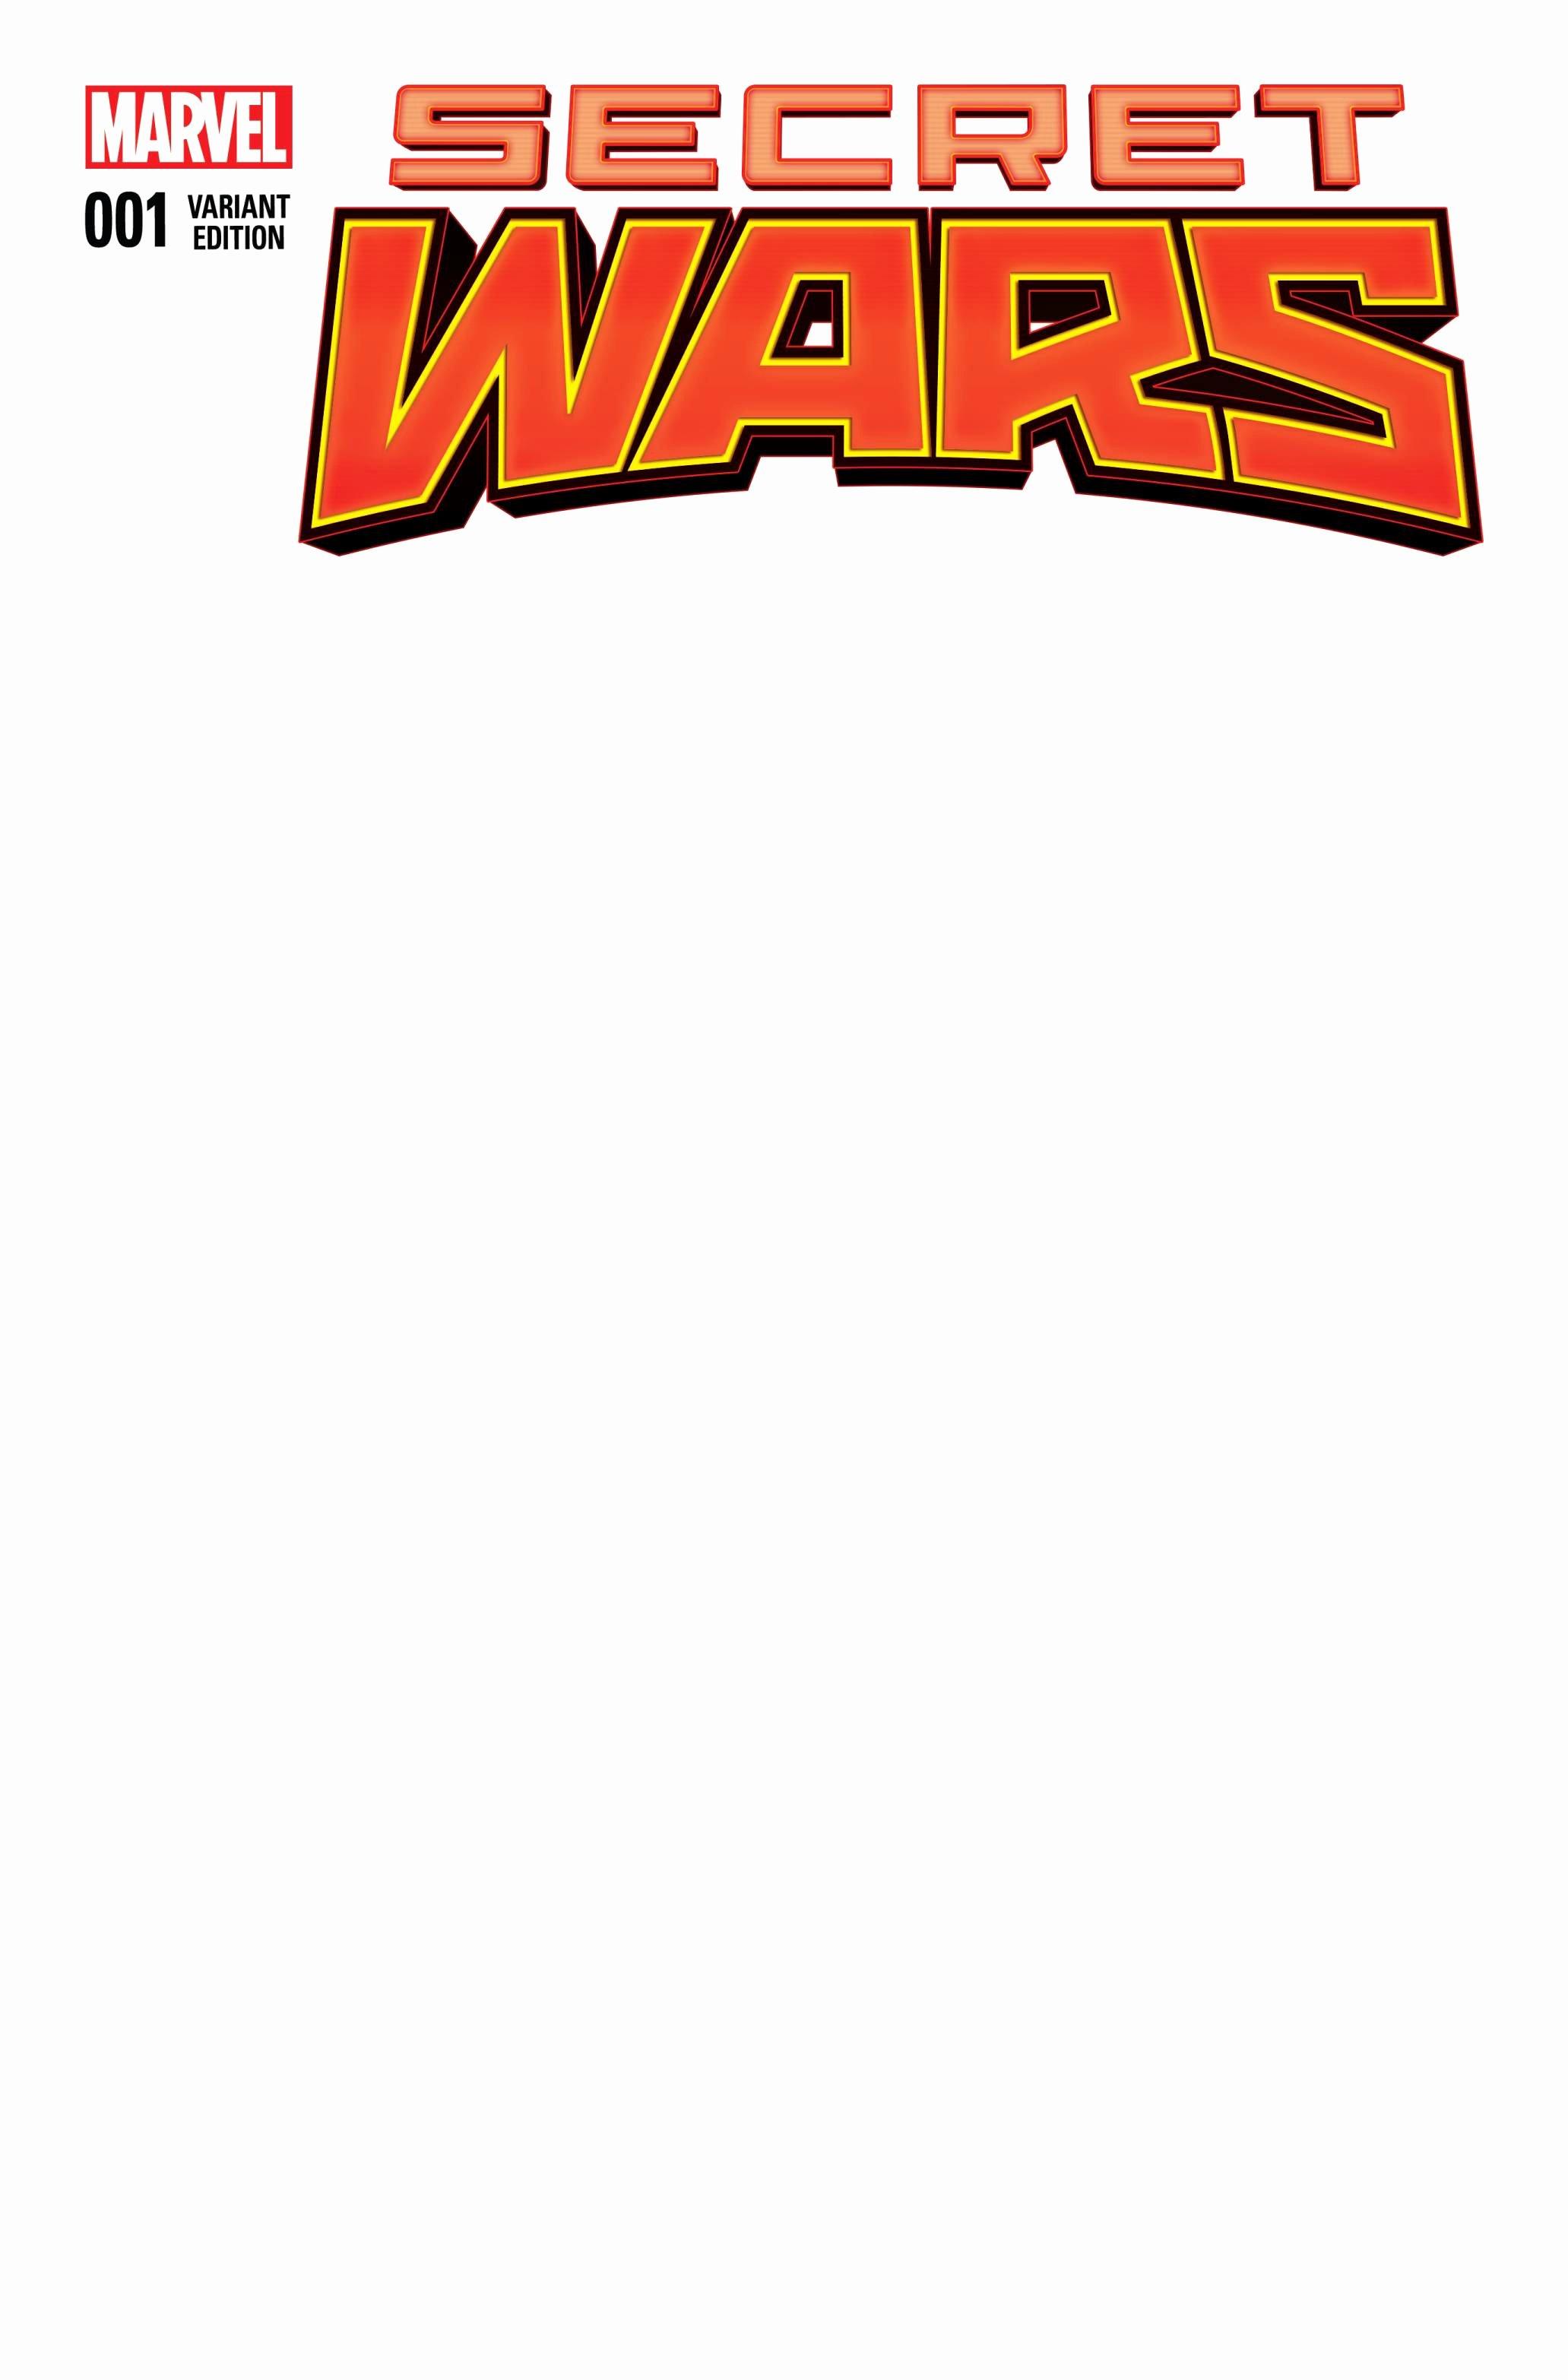 Blank Comic Book Cover Template Inspirational Secret Wars 1 Blank Variant